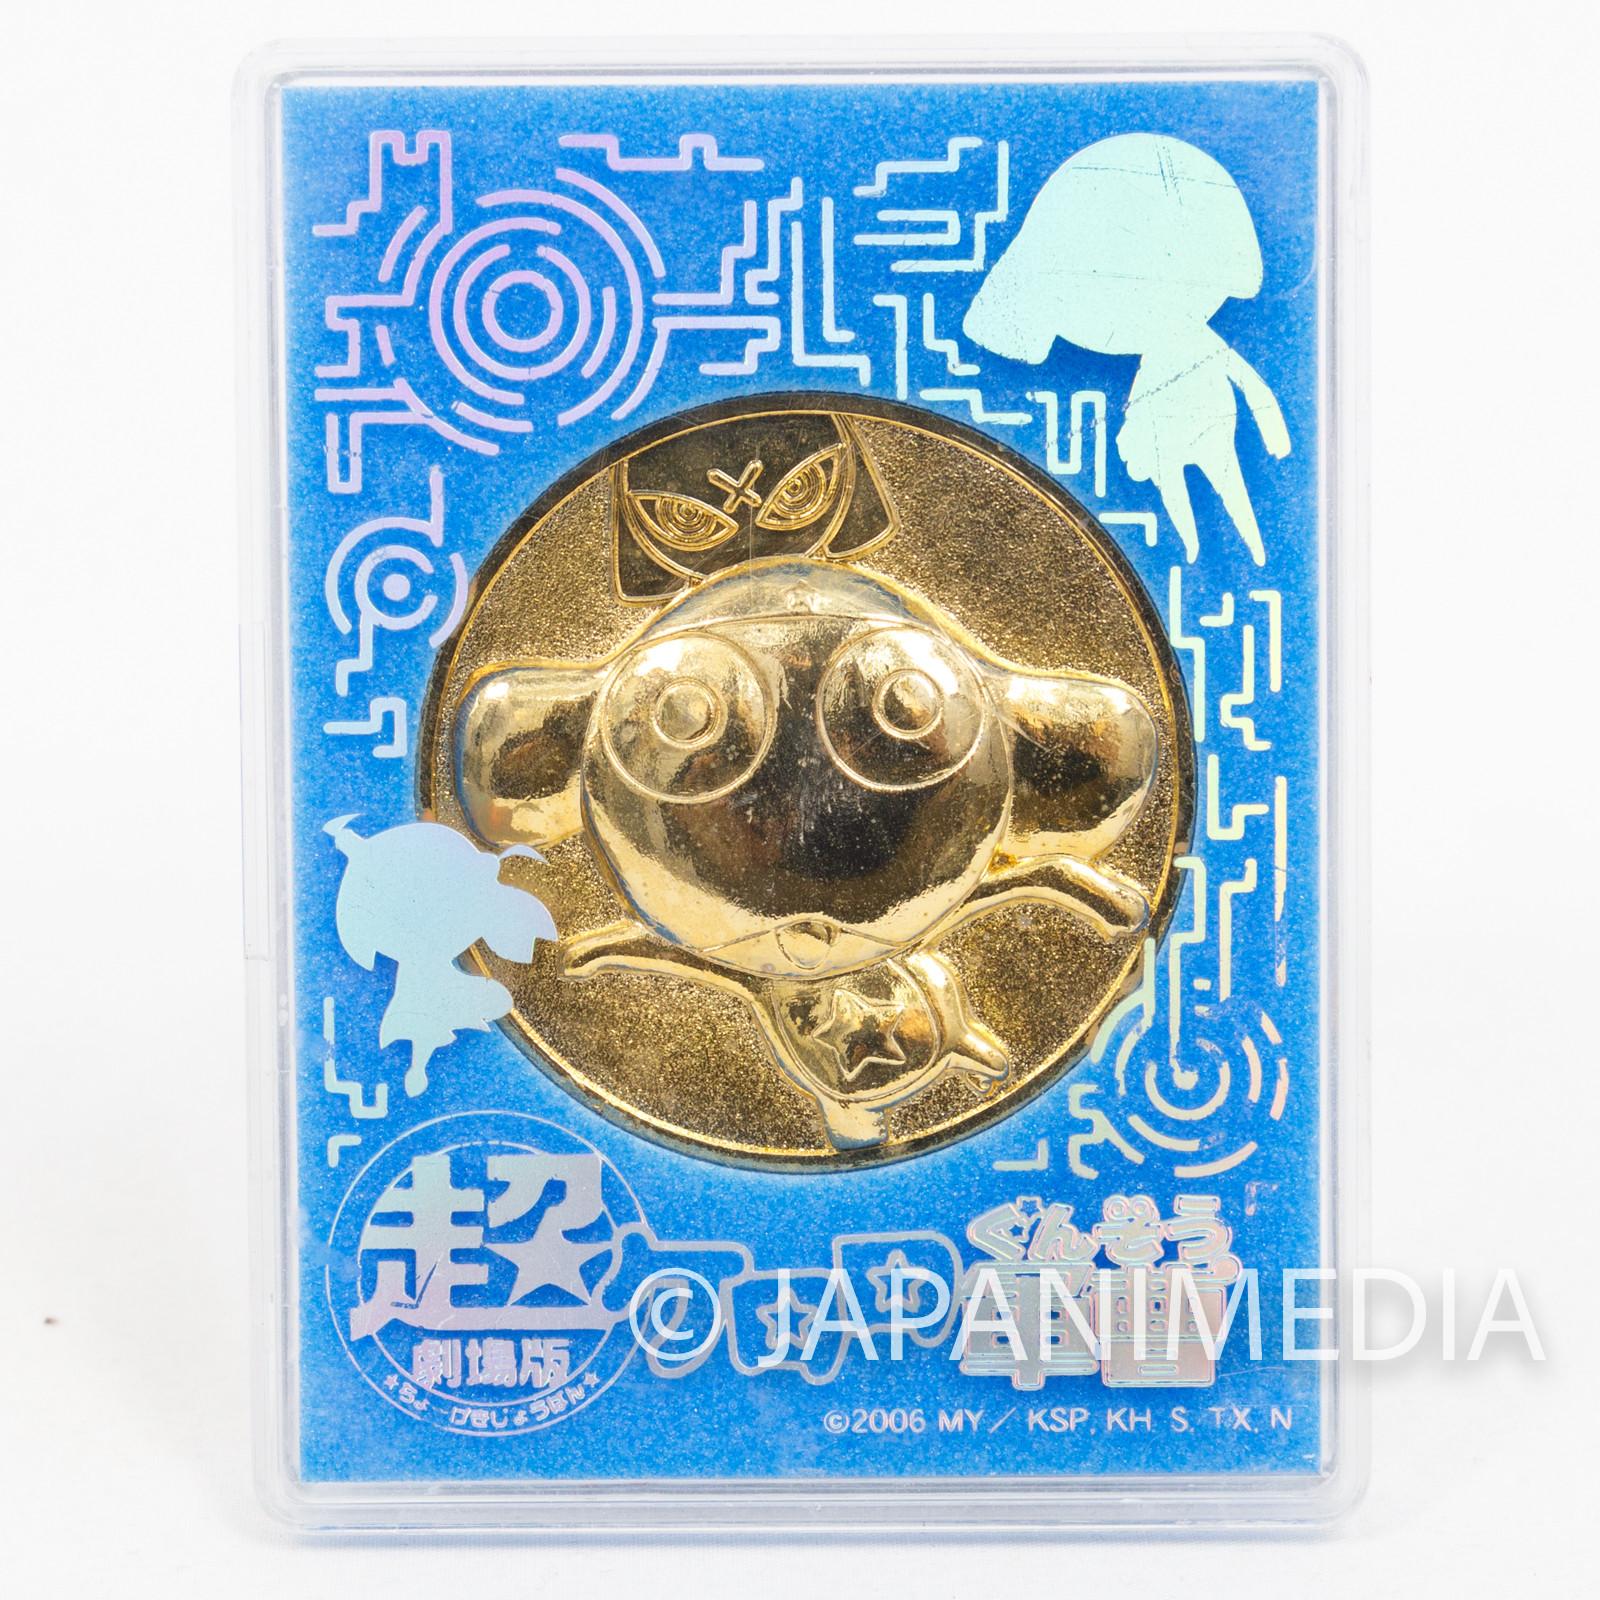 Sgt. Frog Keroro Gunso Movie Golden Medal 2006 JAPAN ANIME MANGA